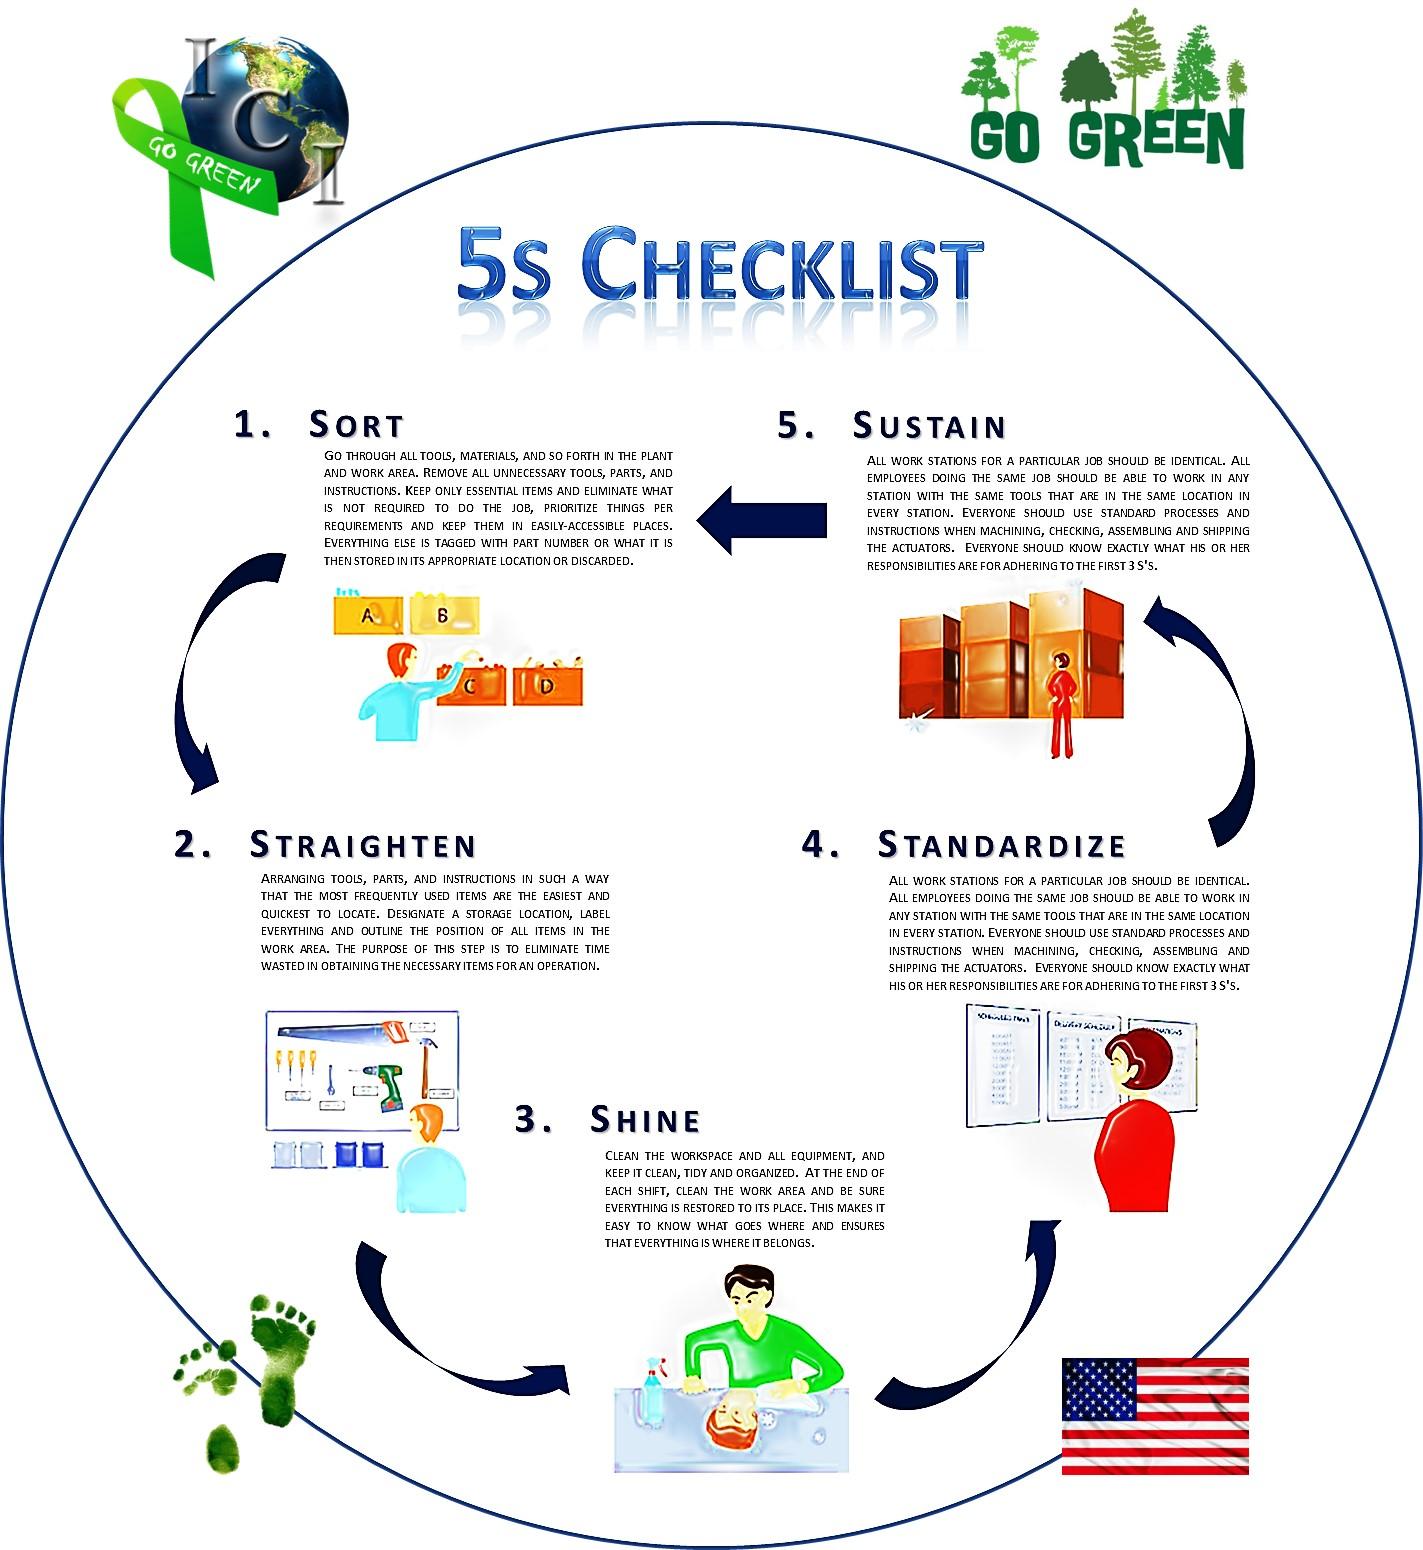 Indelac 5S Lean Manufacturing   Go Green